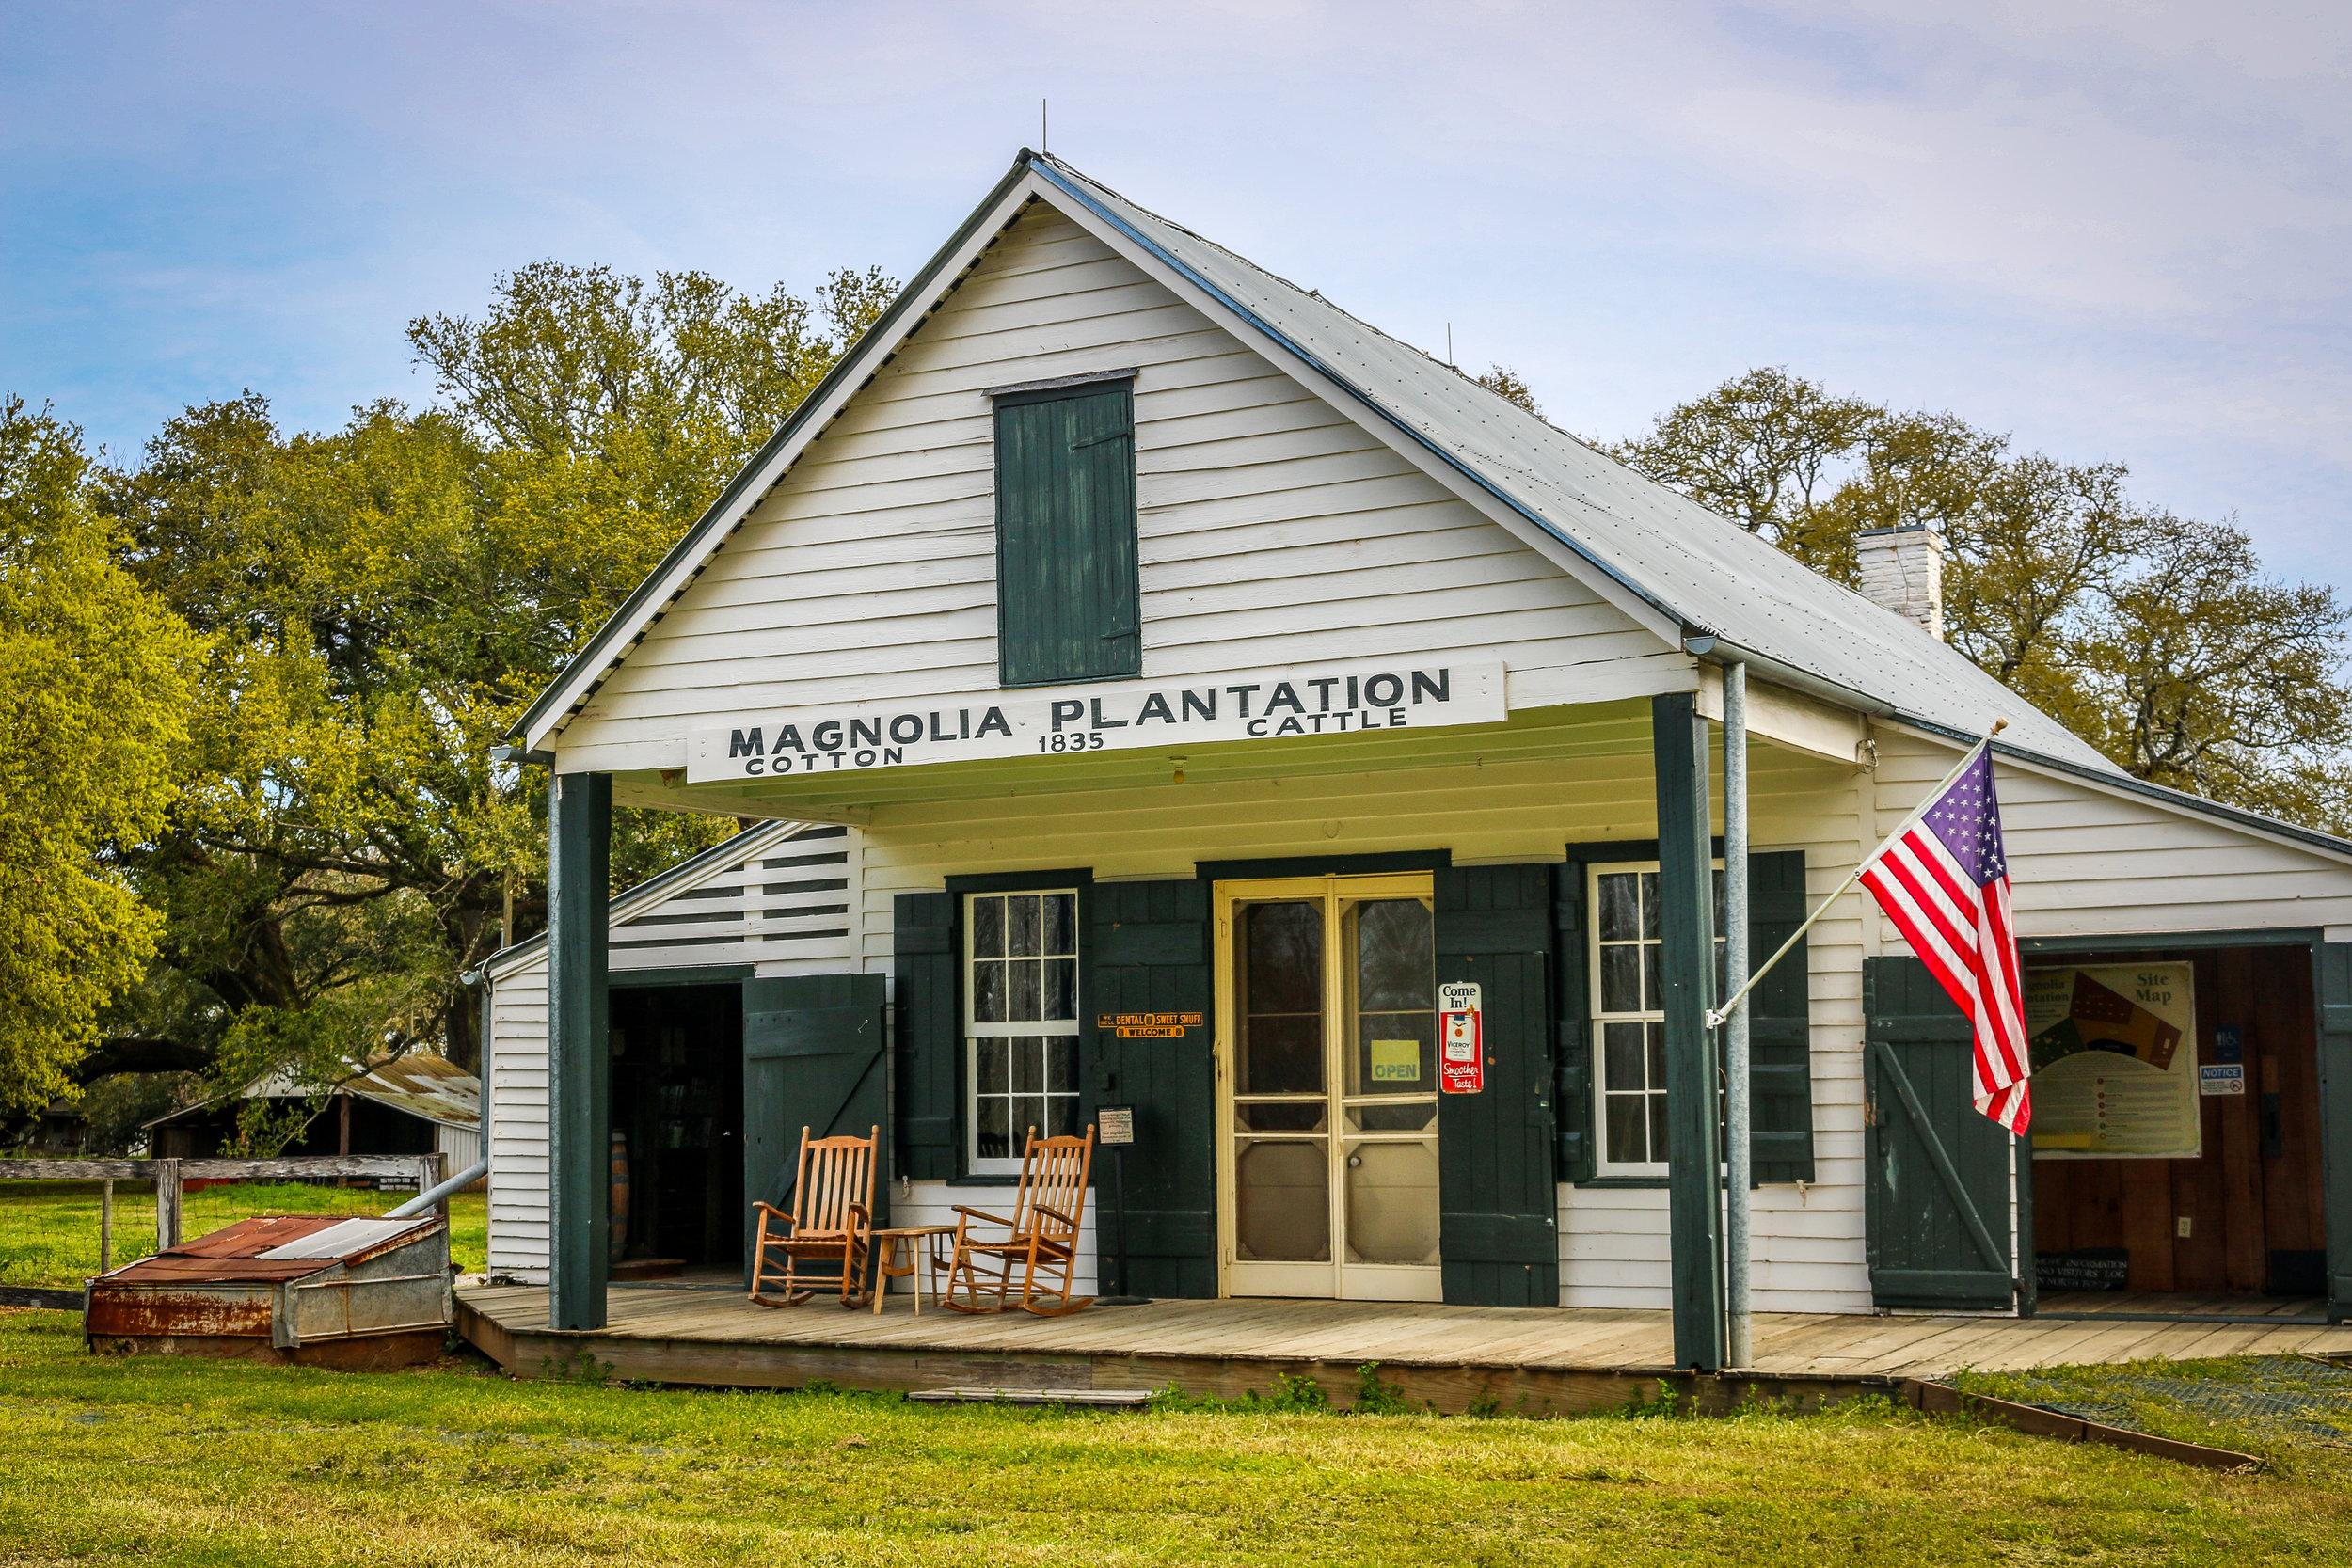 Magnolia Plantation Store